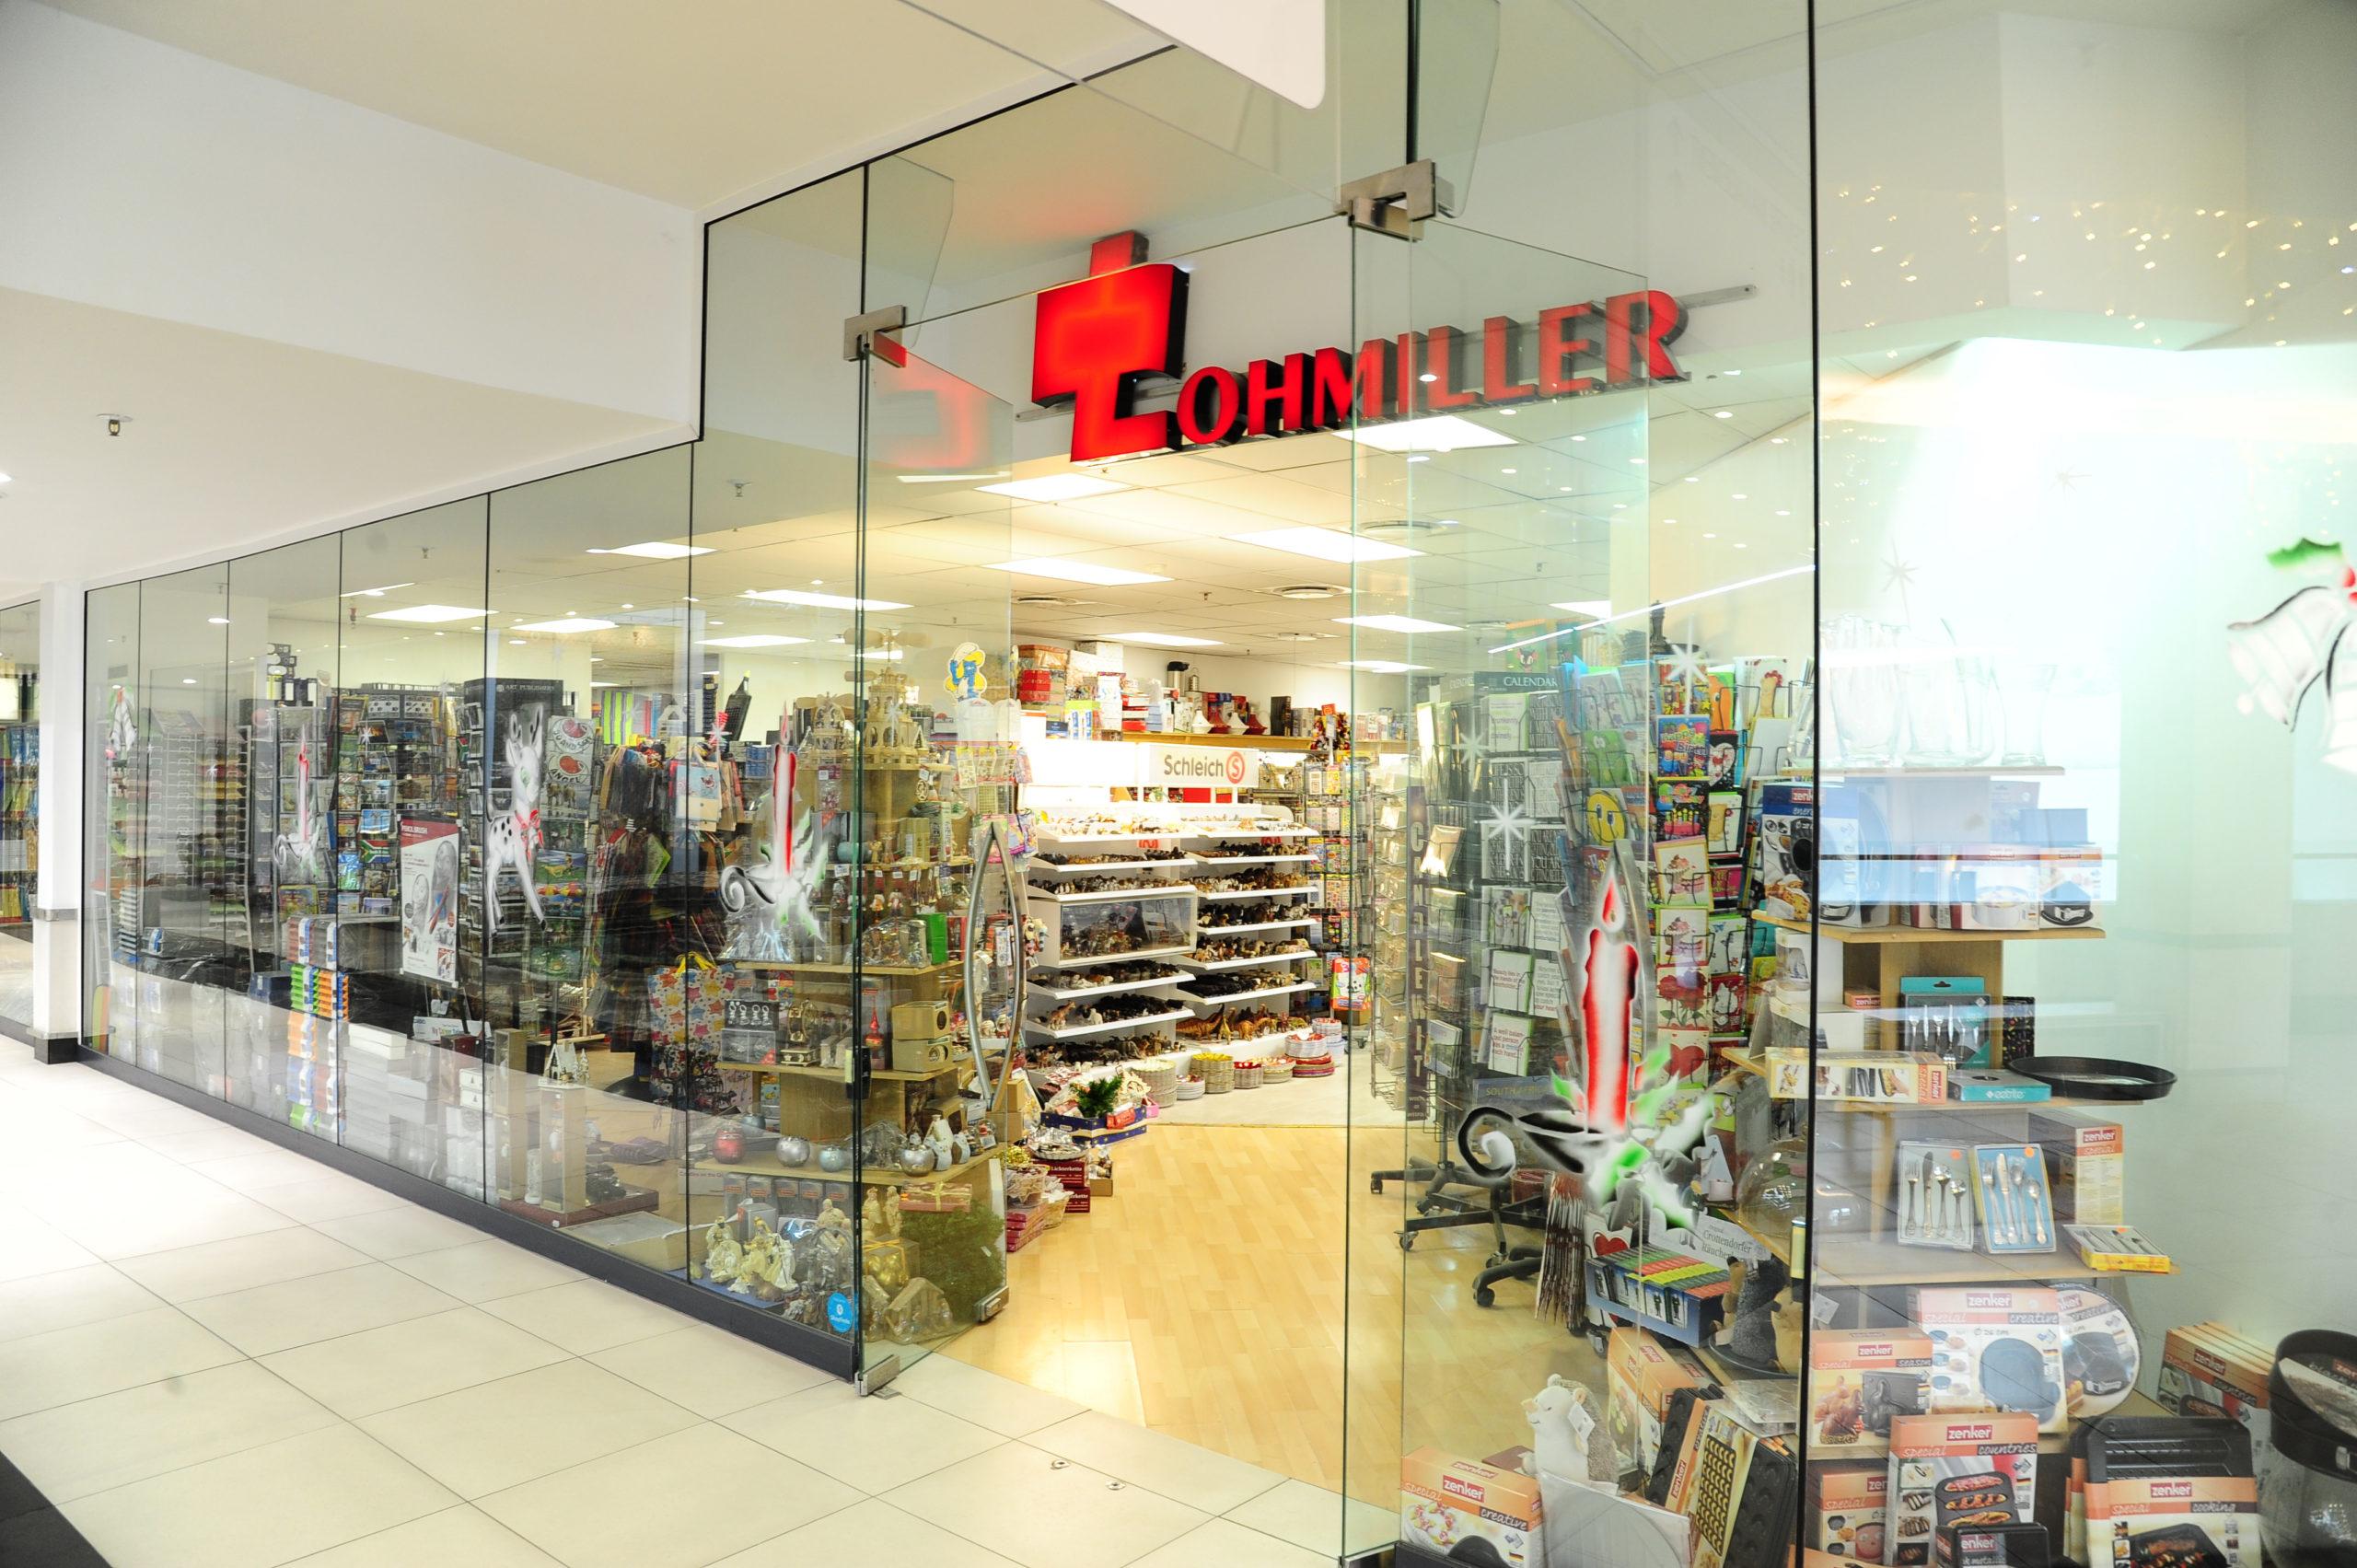 K & P Lohmiller